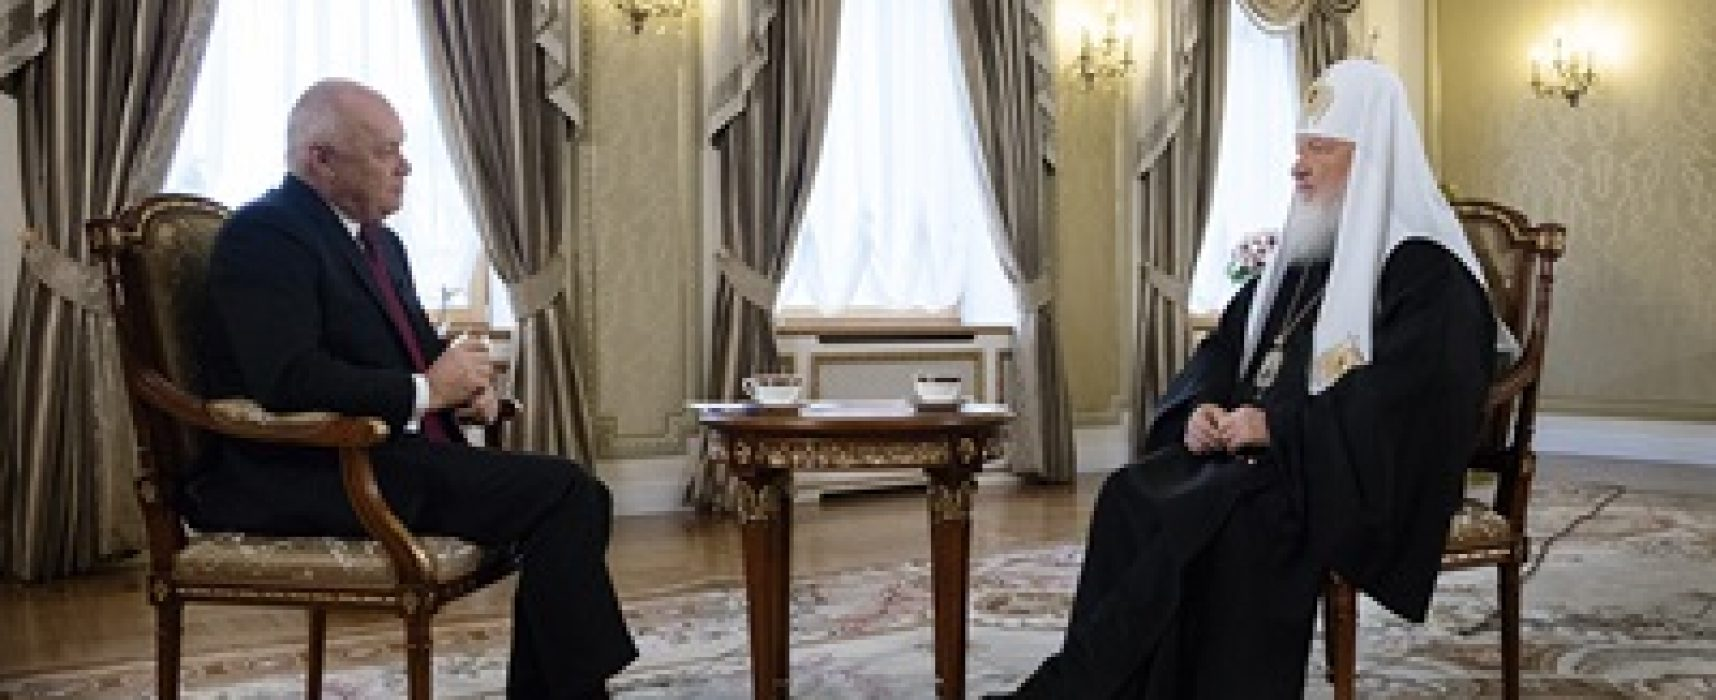 Игорь Яковенко: Откровения Венедиктова, Гундяева и Путина